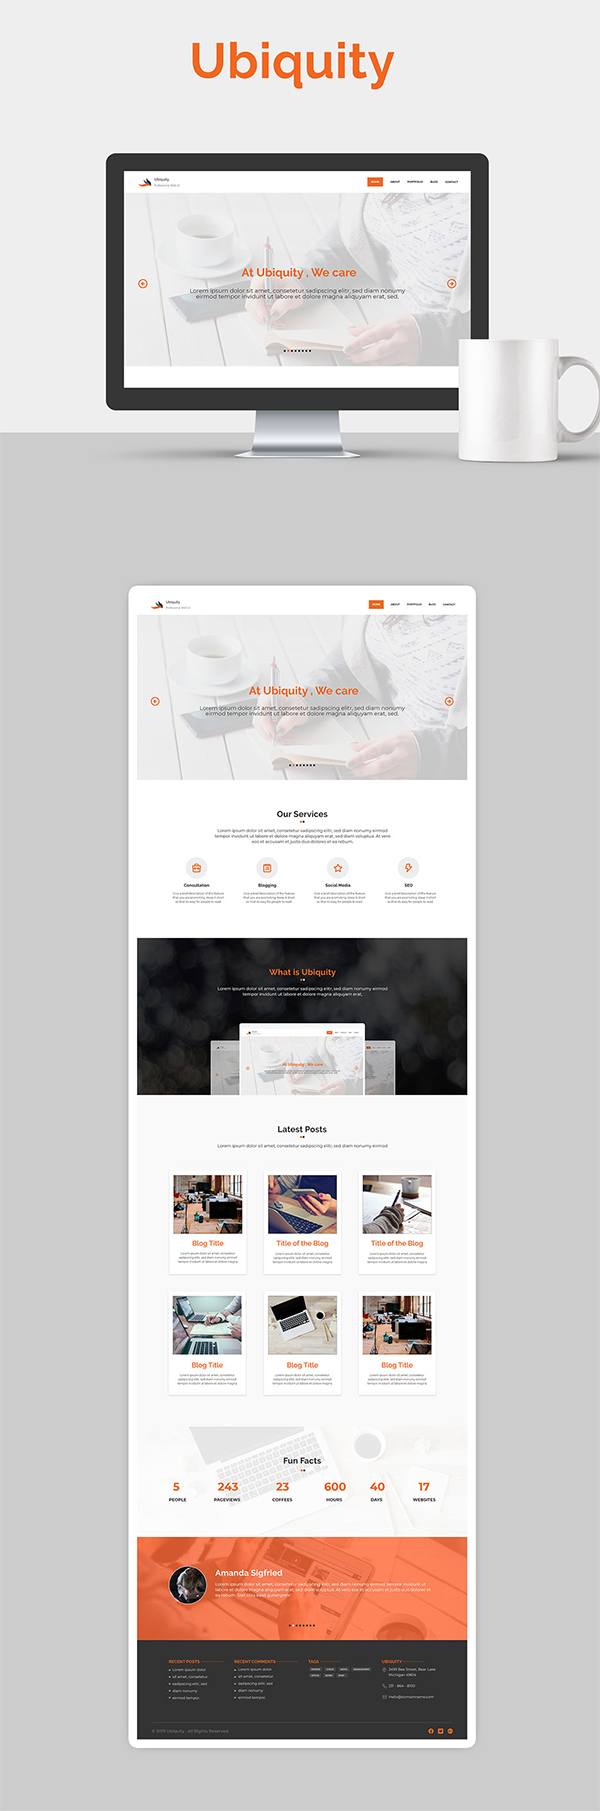 Free Website UI XD Template